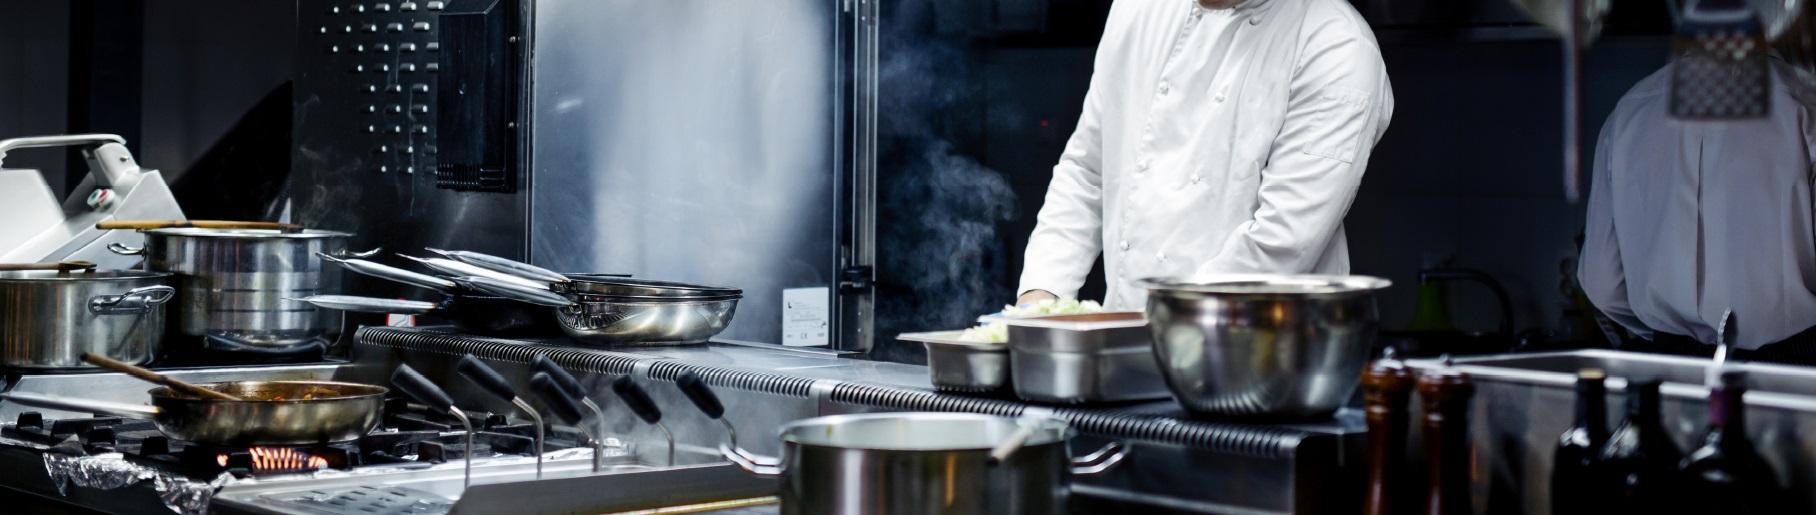 Equipements professionnels grande cuisine